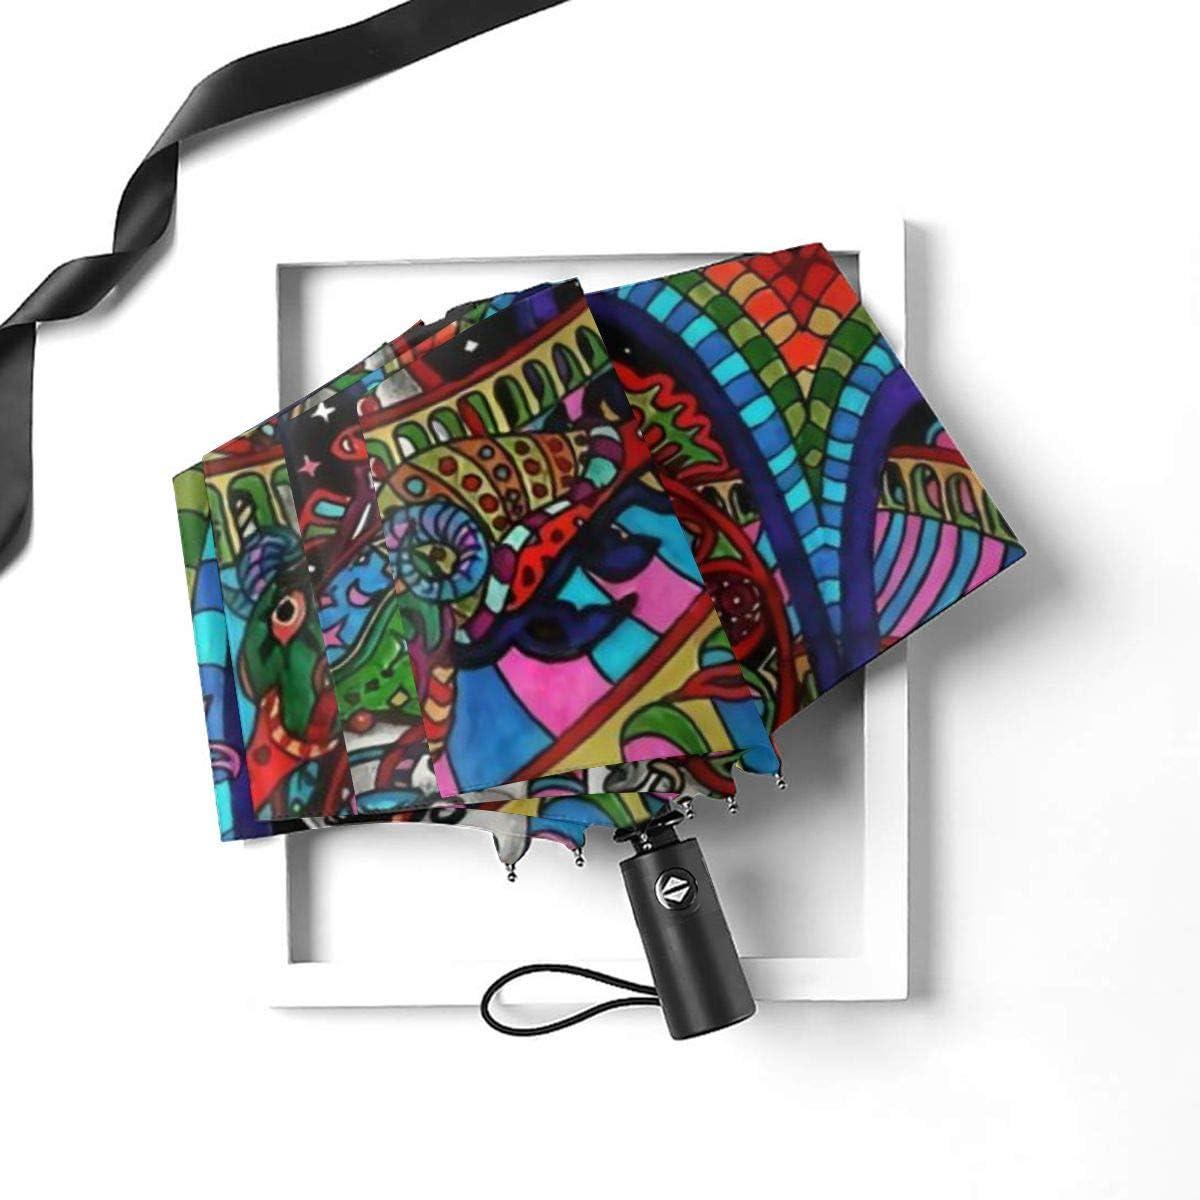 Mandala Psychedelic African Queen Sun Umbrella Compact Folding Travel Umbrella Auto Open And Close For Windproof Rainproof UV Protection Parasol